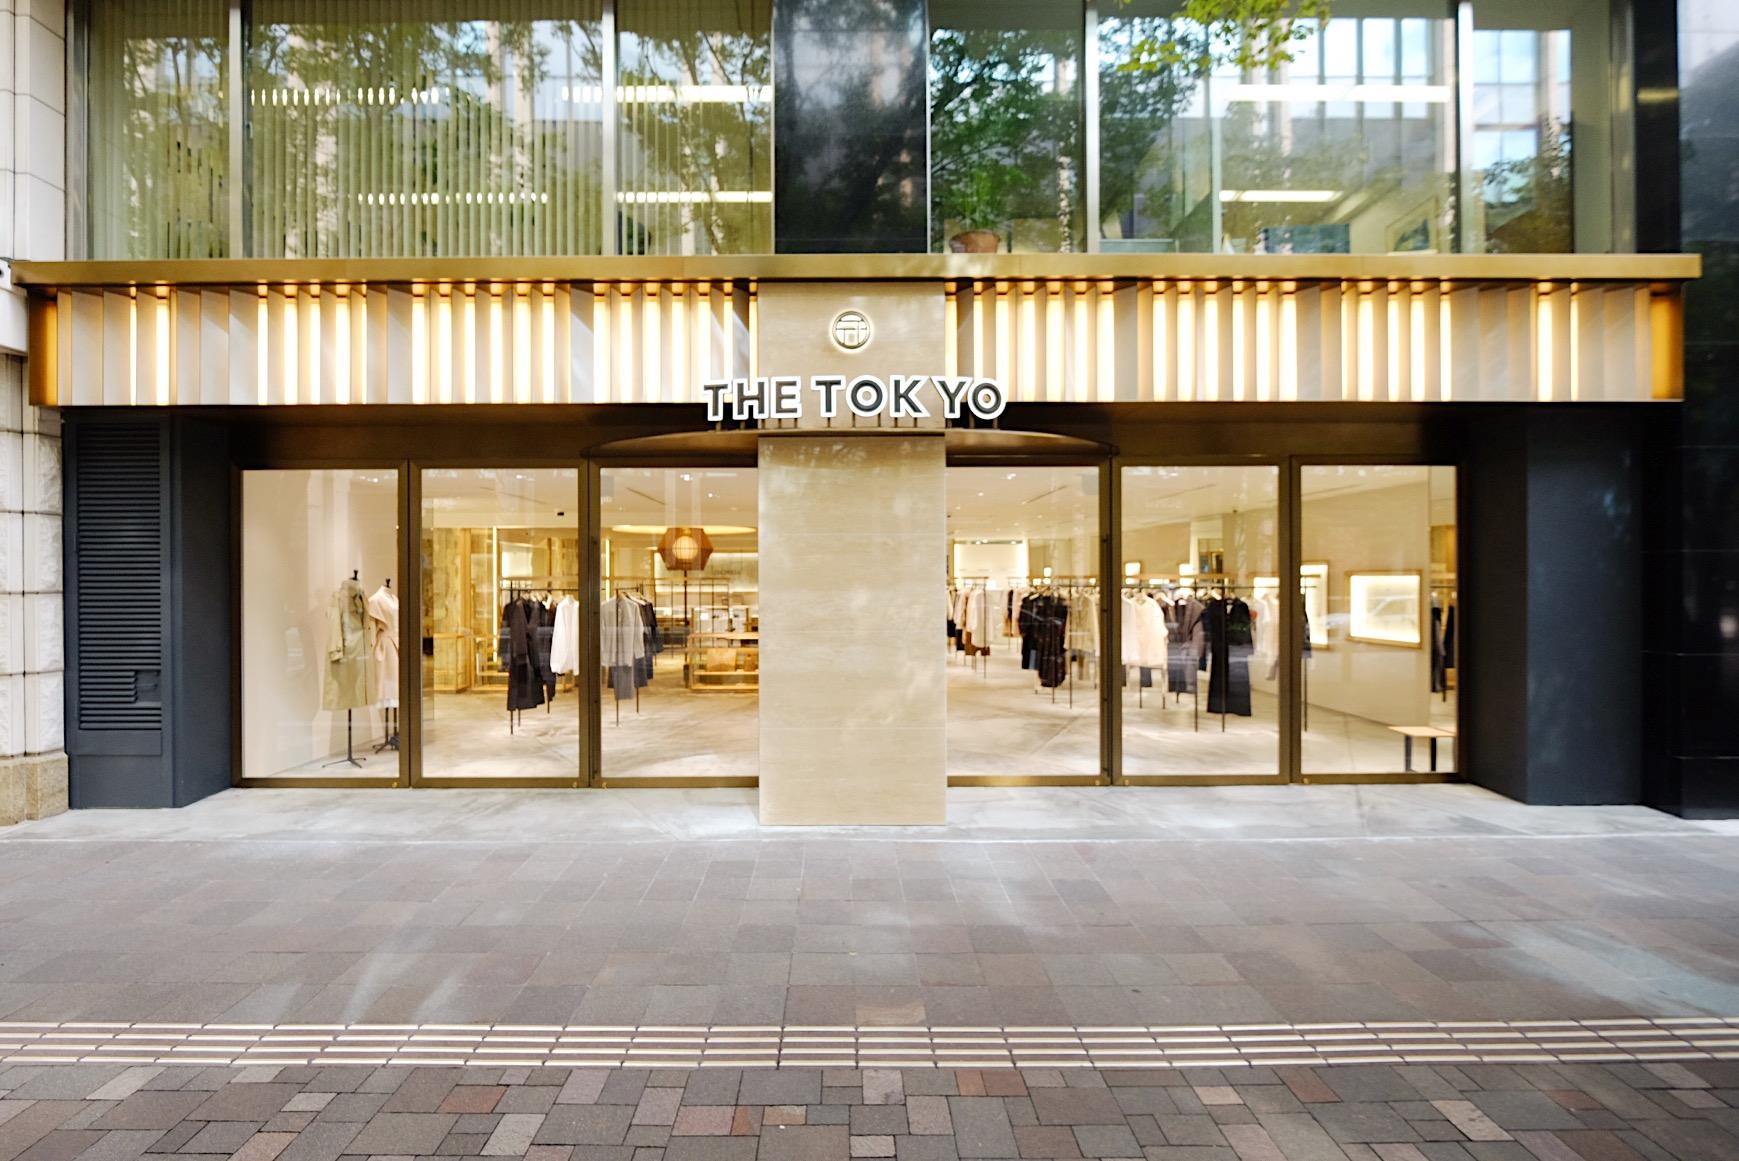 THE TOKYO事業 START